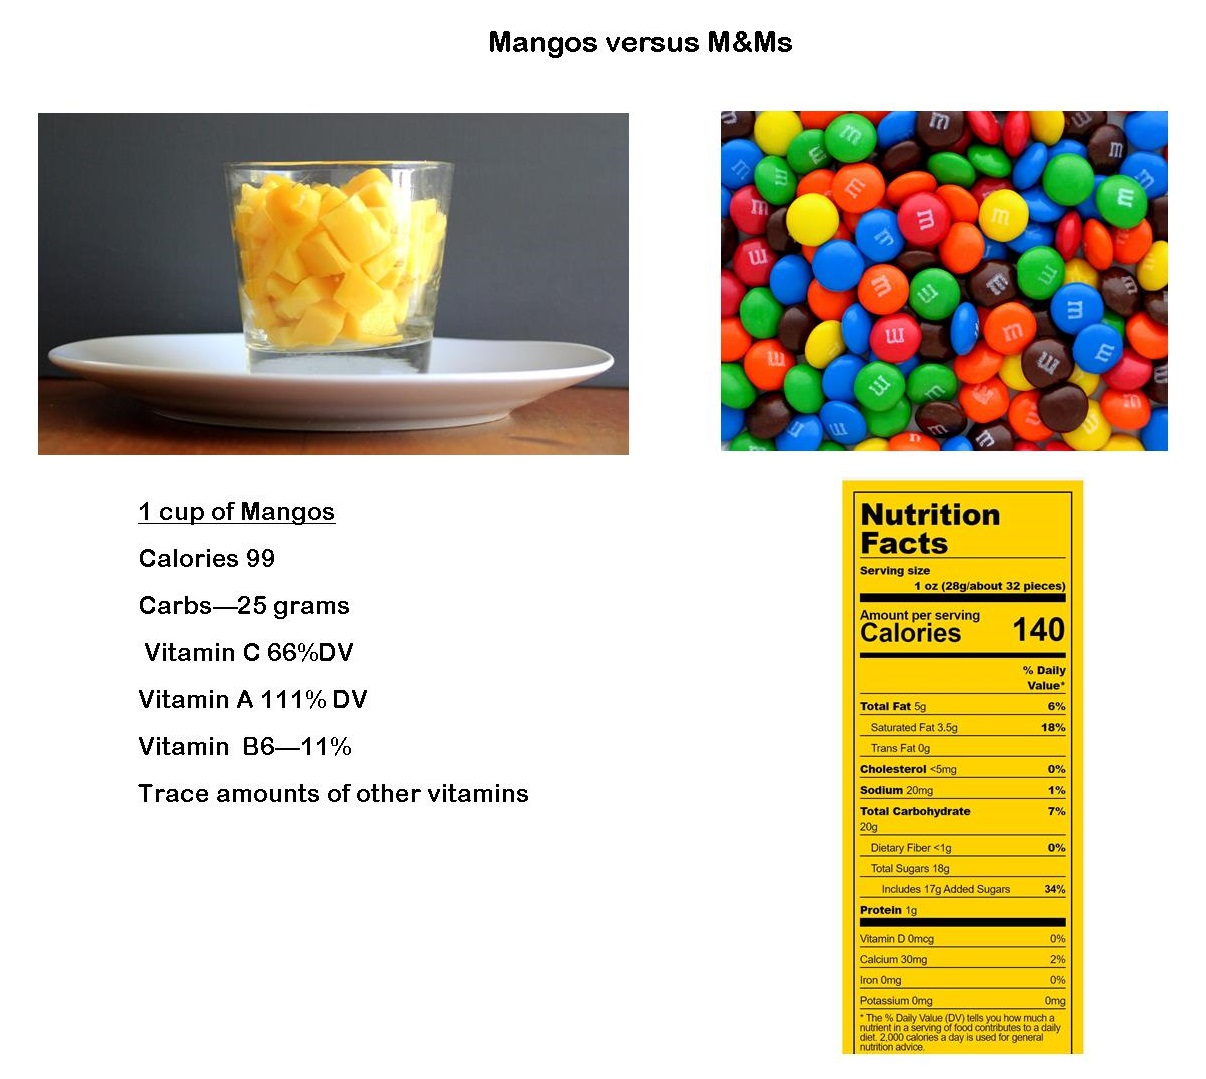 mango vs m&m